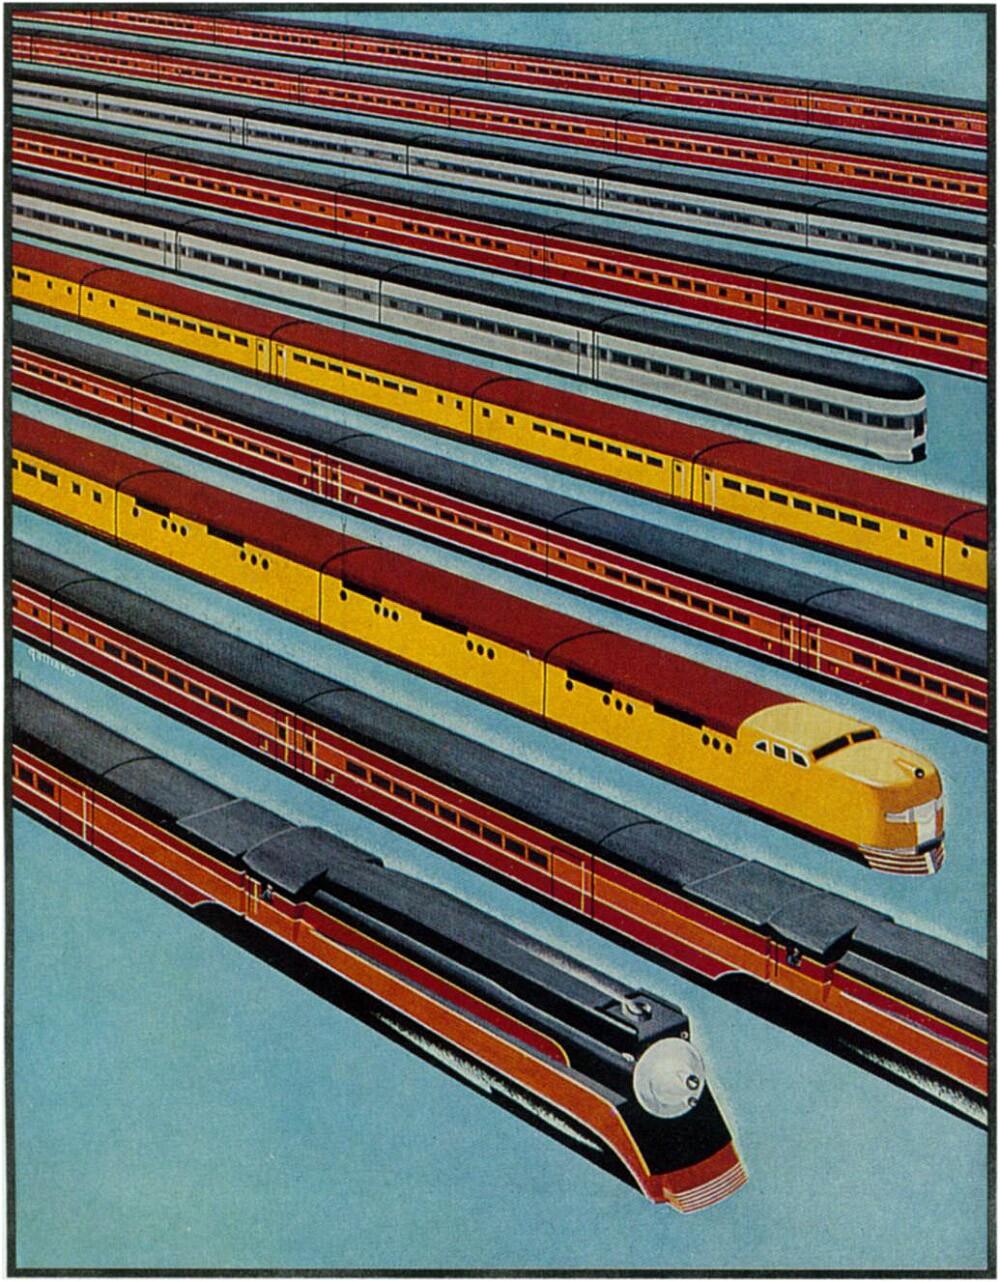 Streamliners